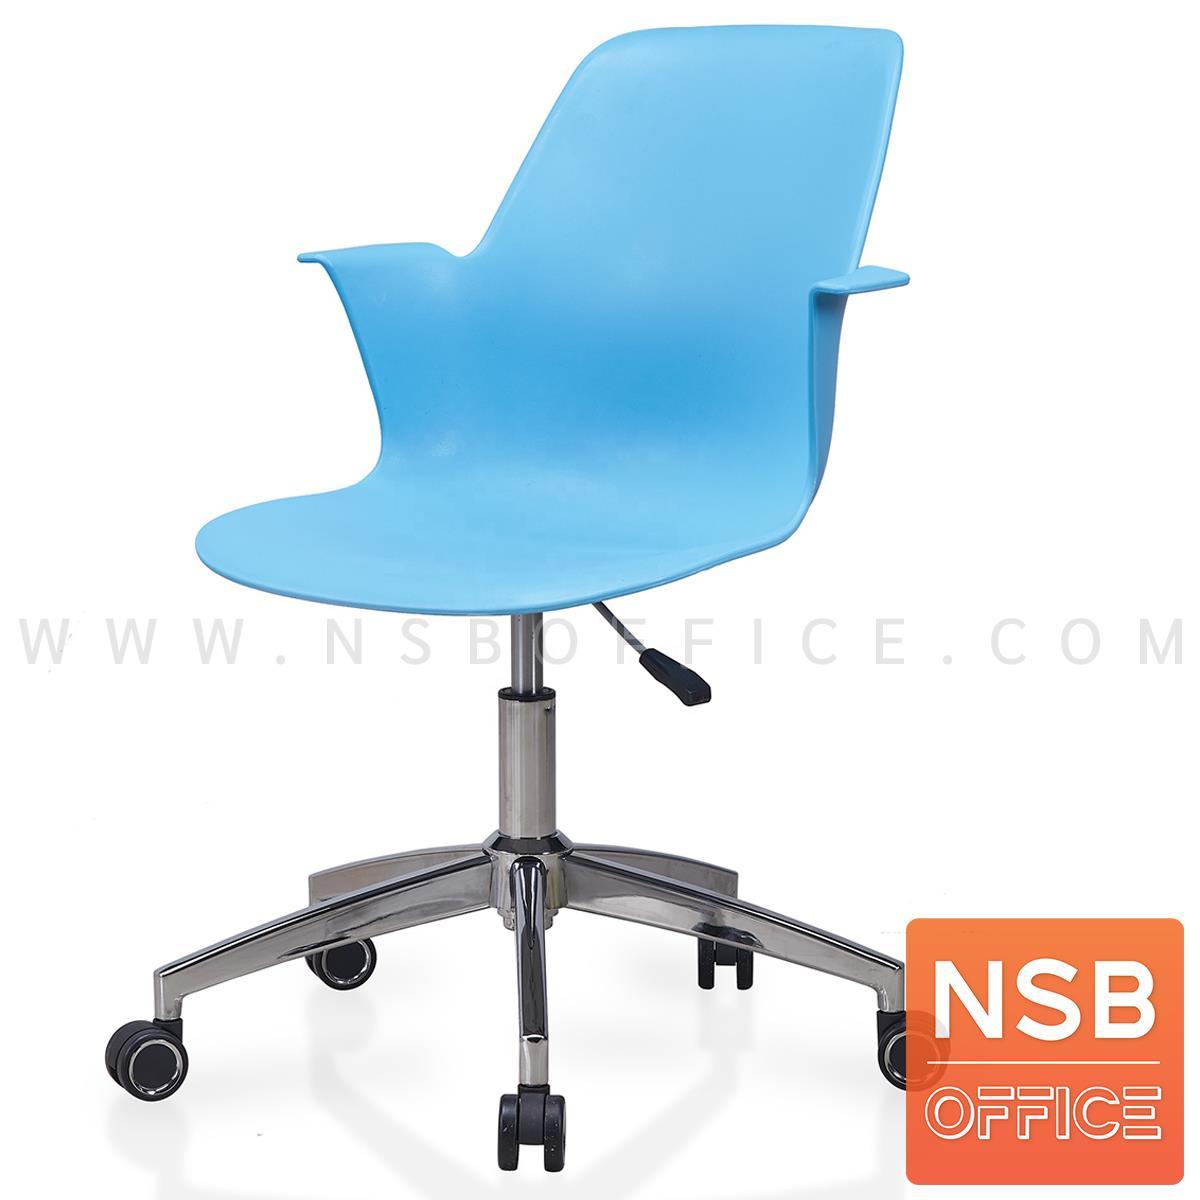 B30A050:เก้าอี้อเนกประสงค์เฟรมโพลี่ รุ่น Avery (เอเวอรี่)  ปรับระดับได้